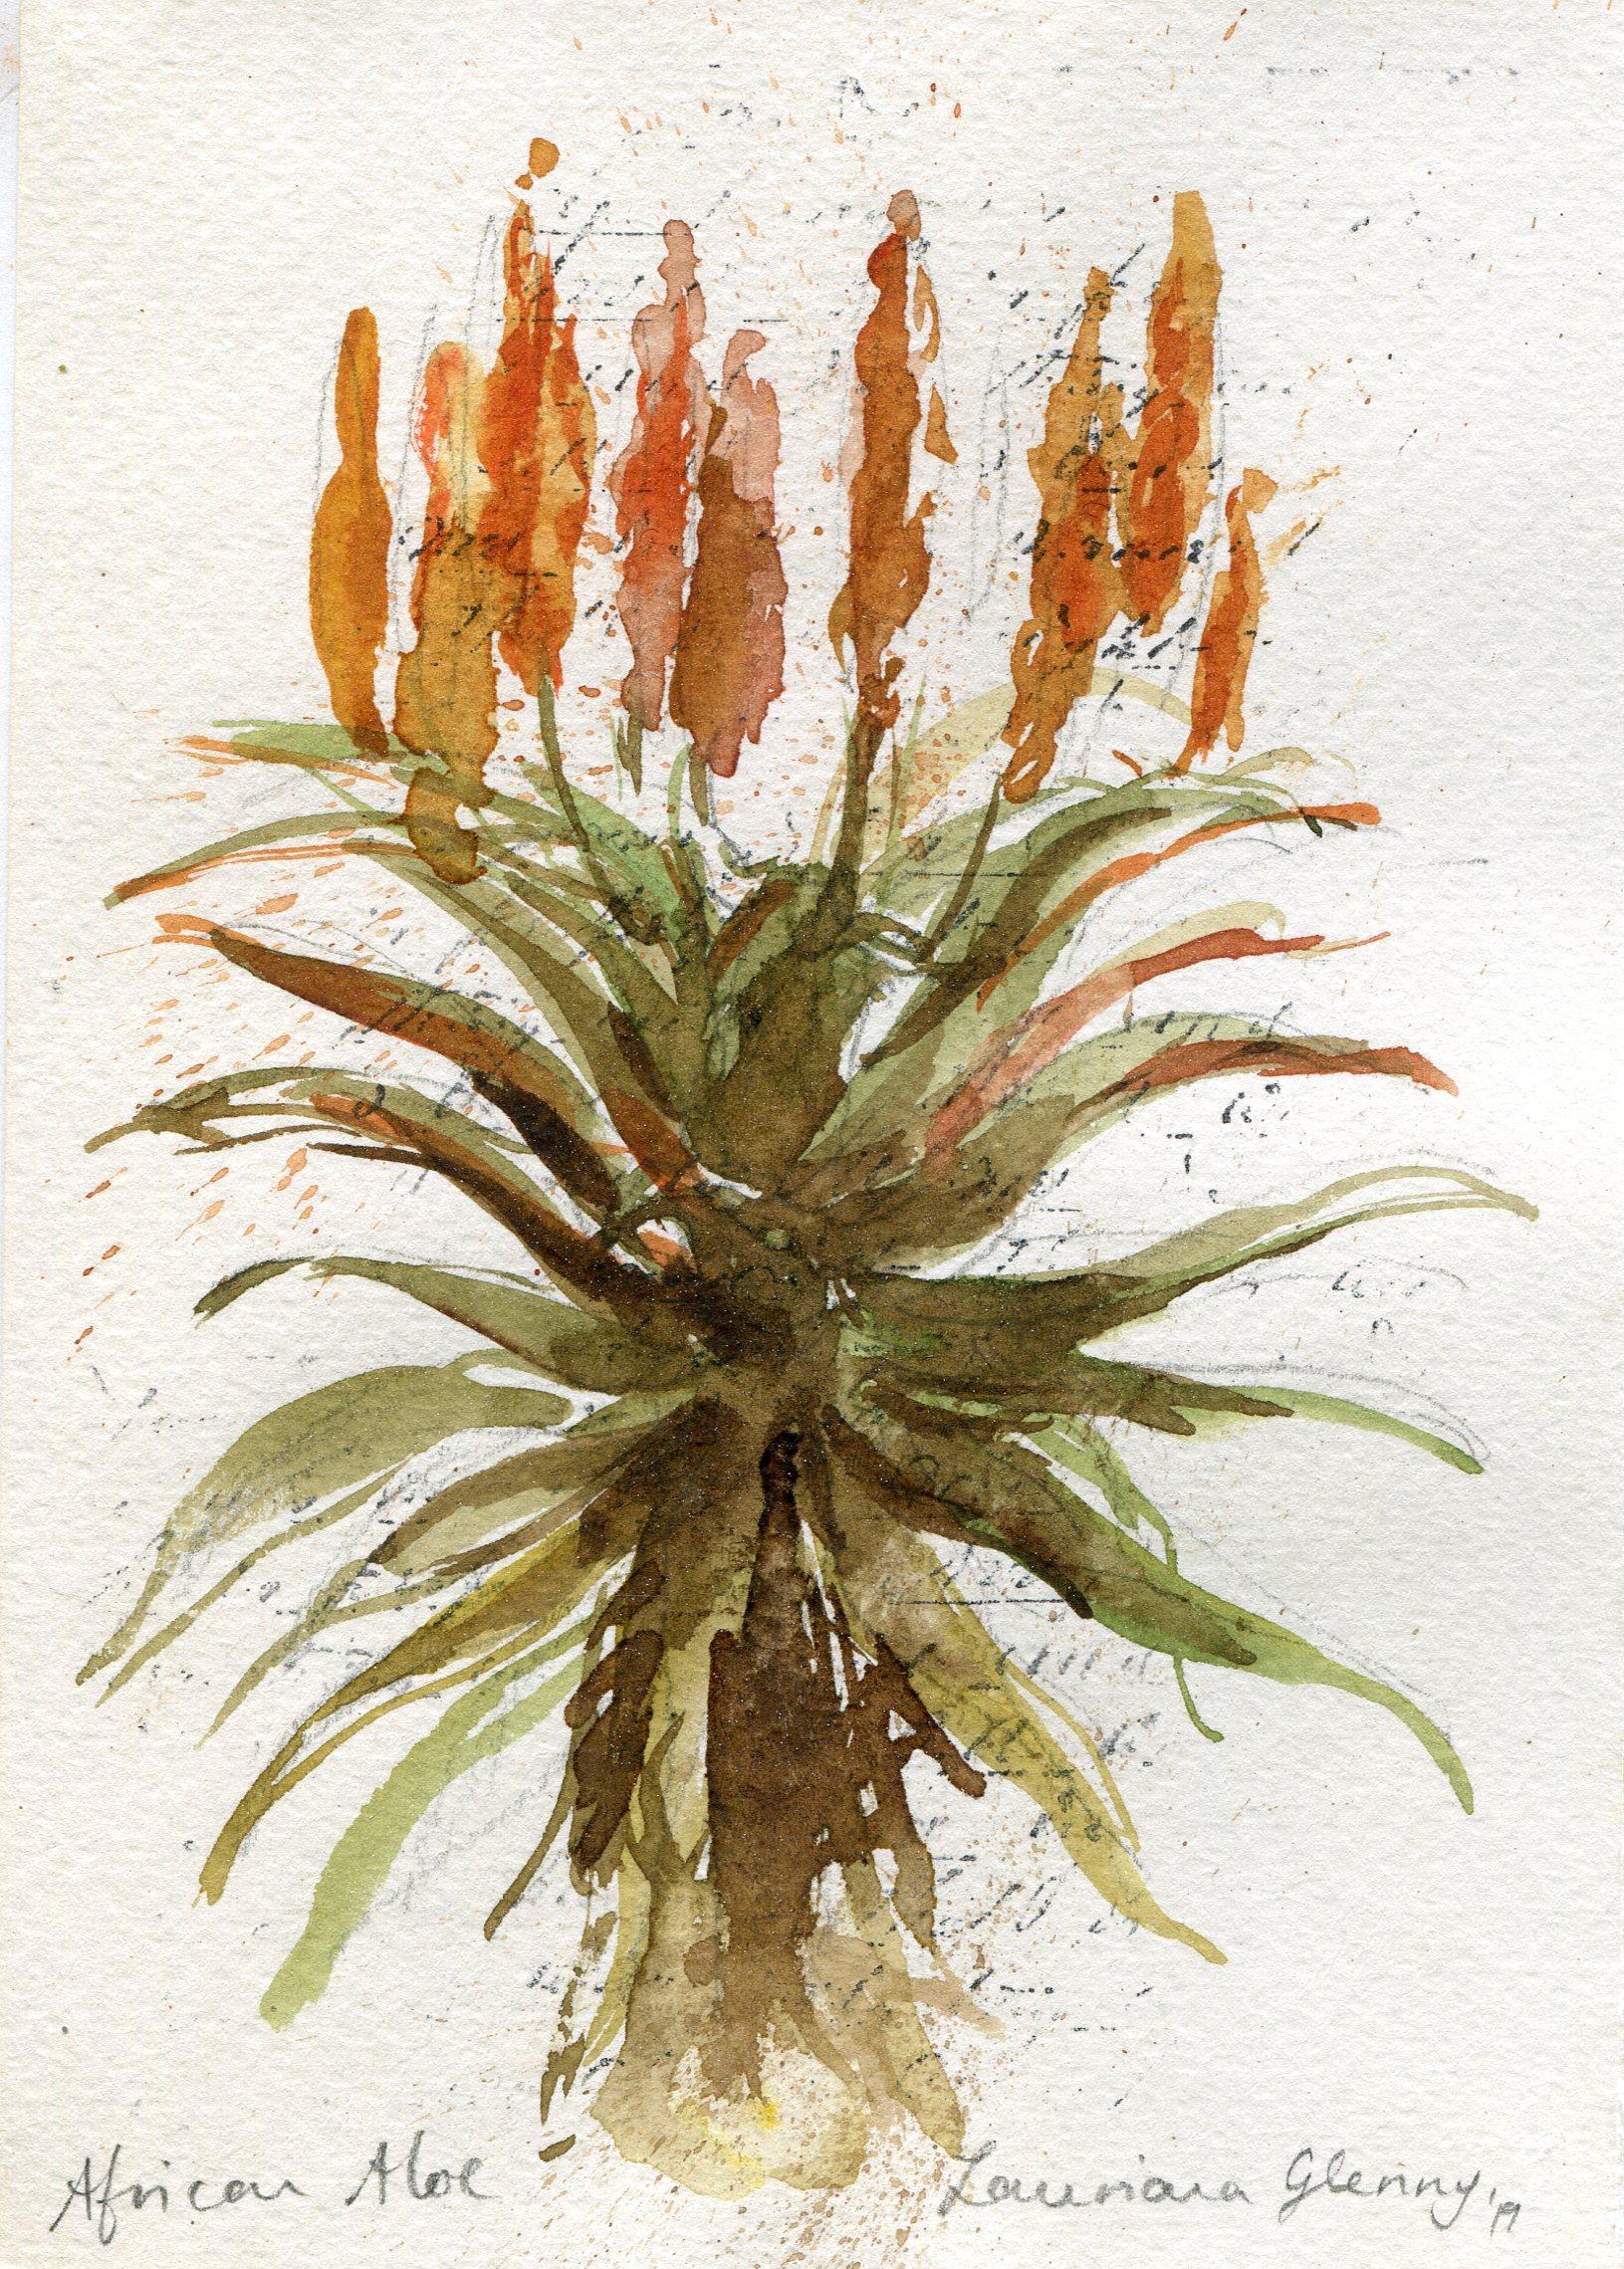 39c  Lauriana Glenny  Aloe III  watercolour on paper